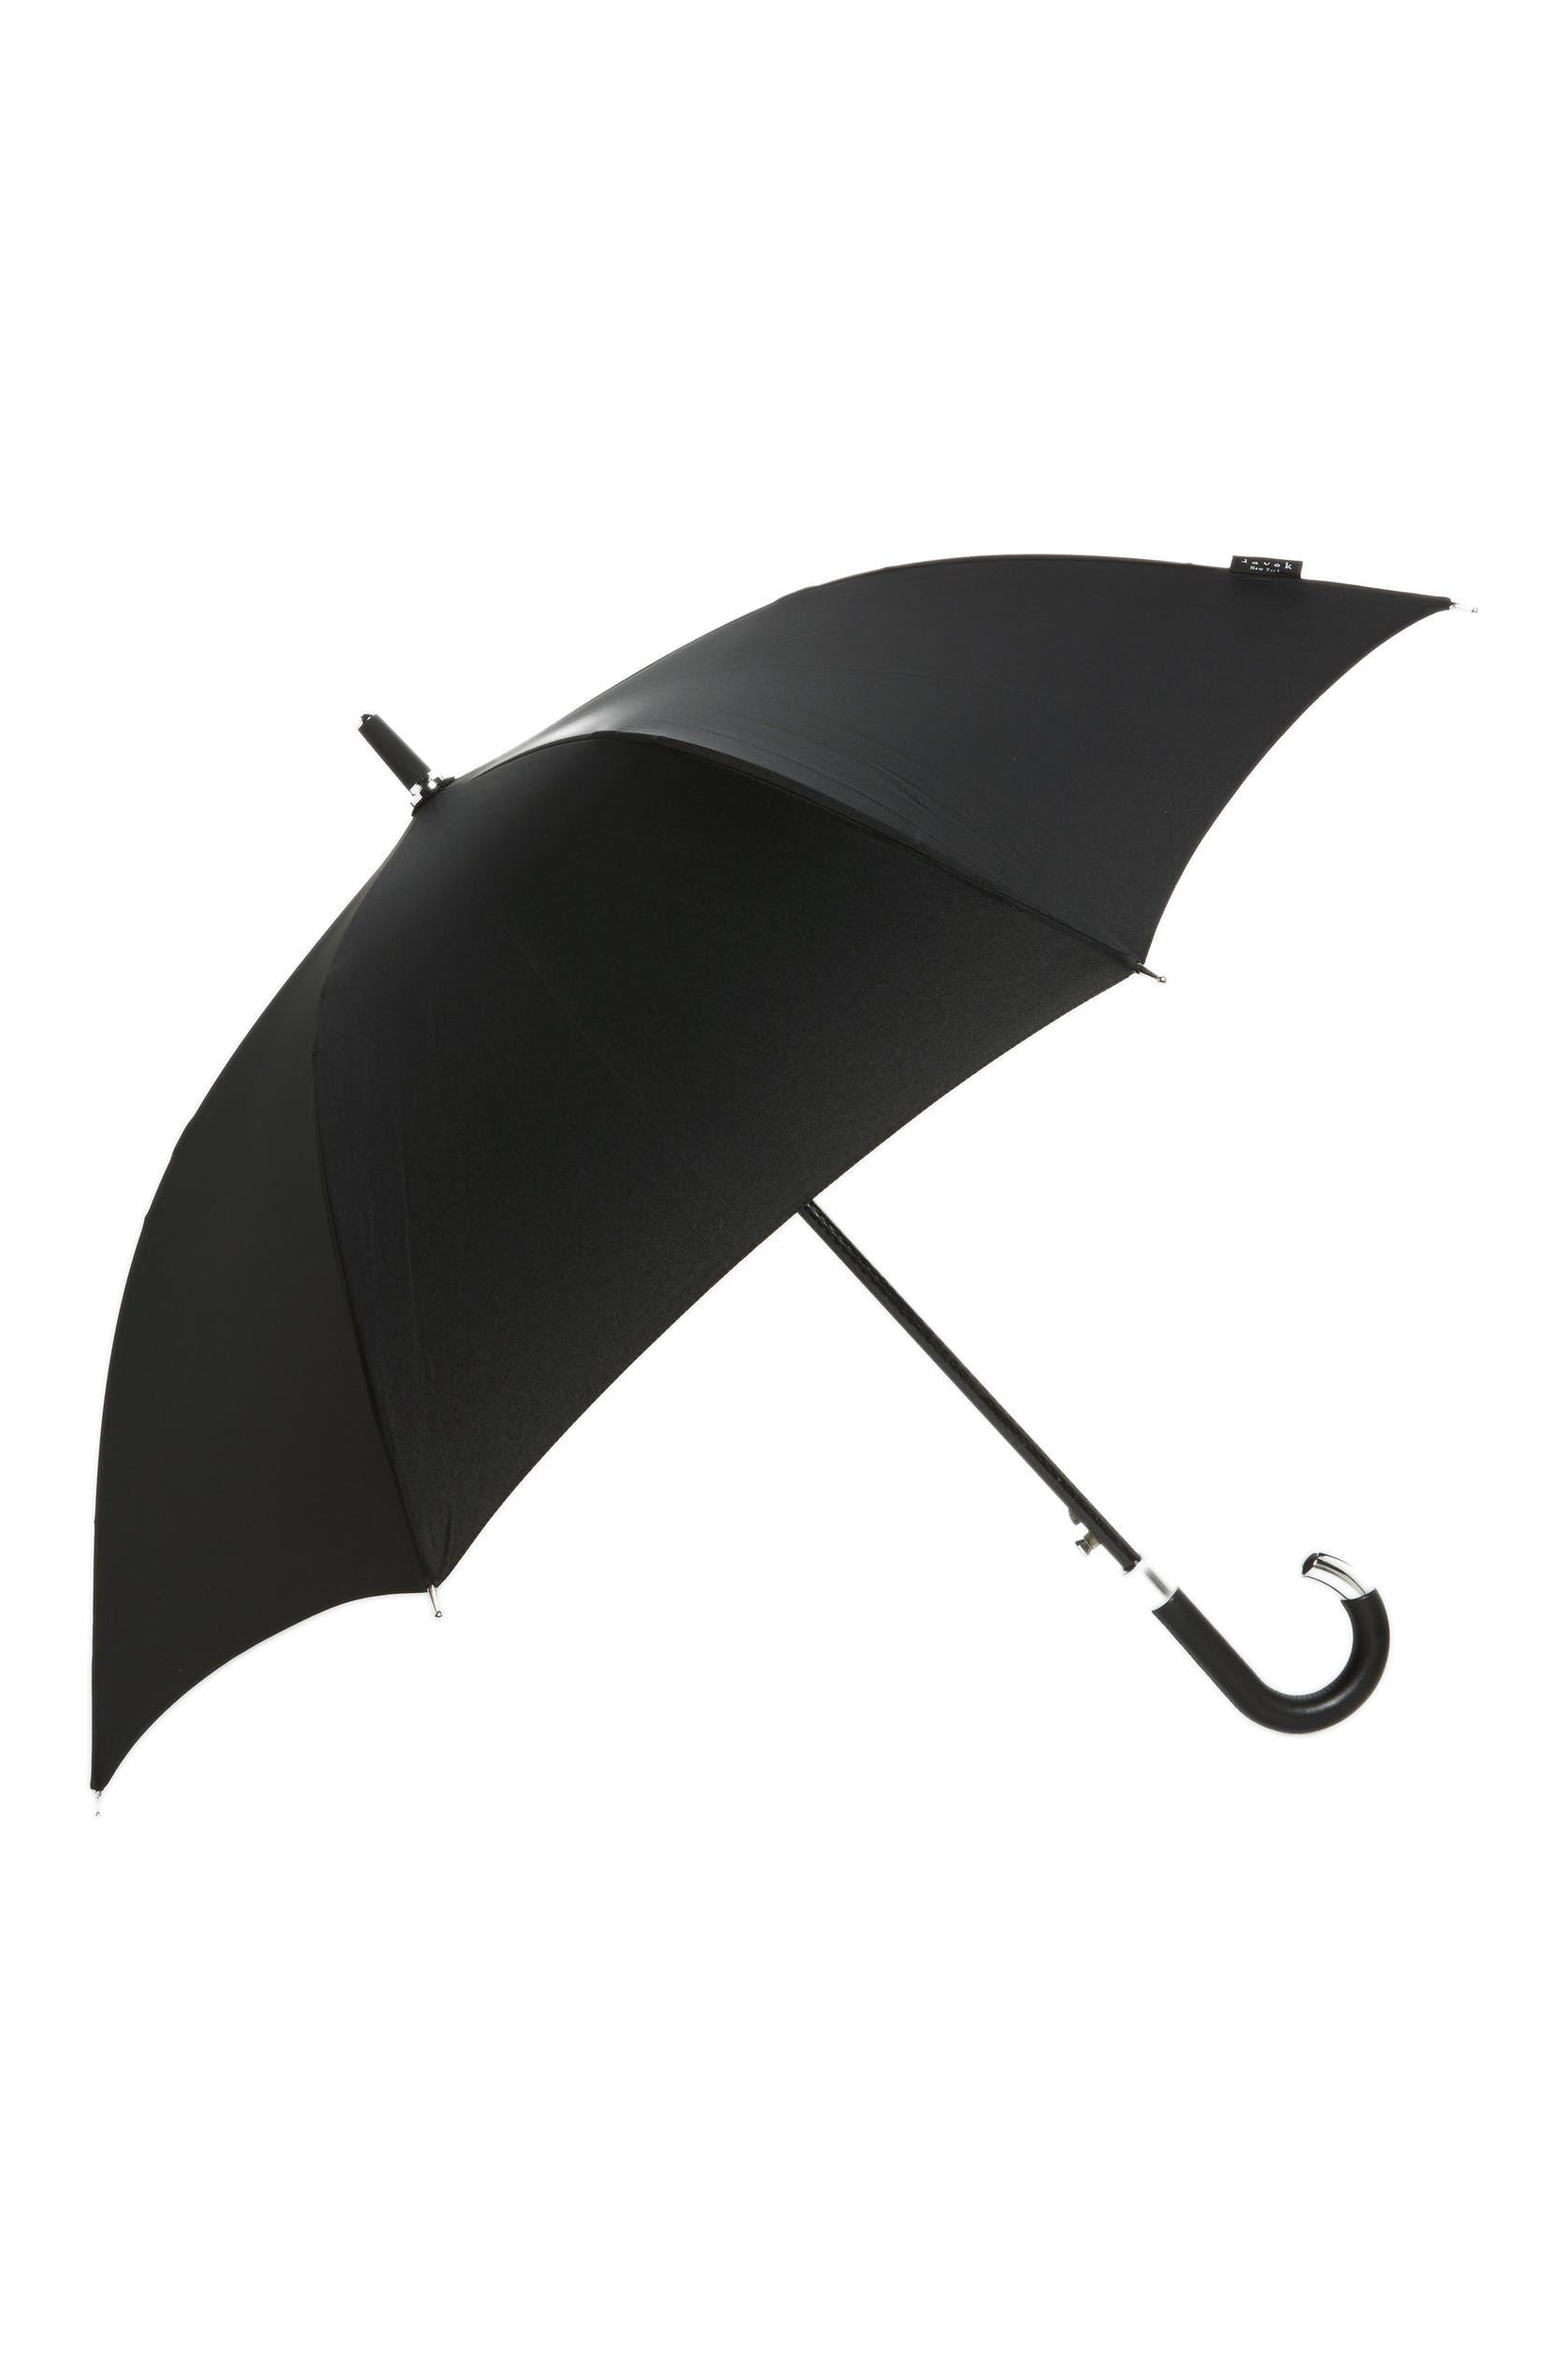 69418d648 DAVEK Elite Cane Umbrella | Nordstrom